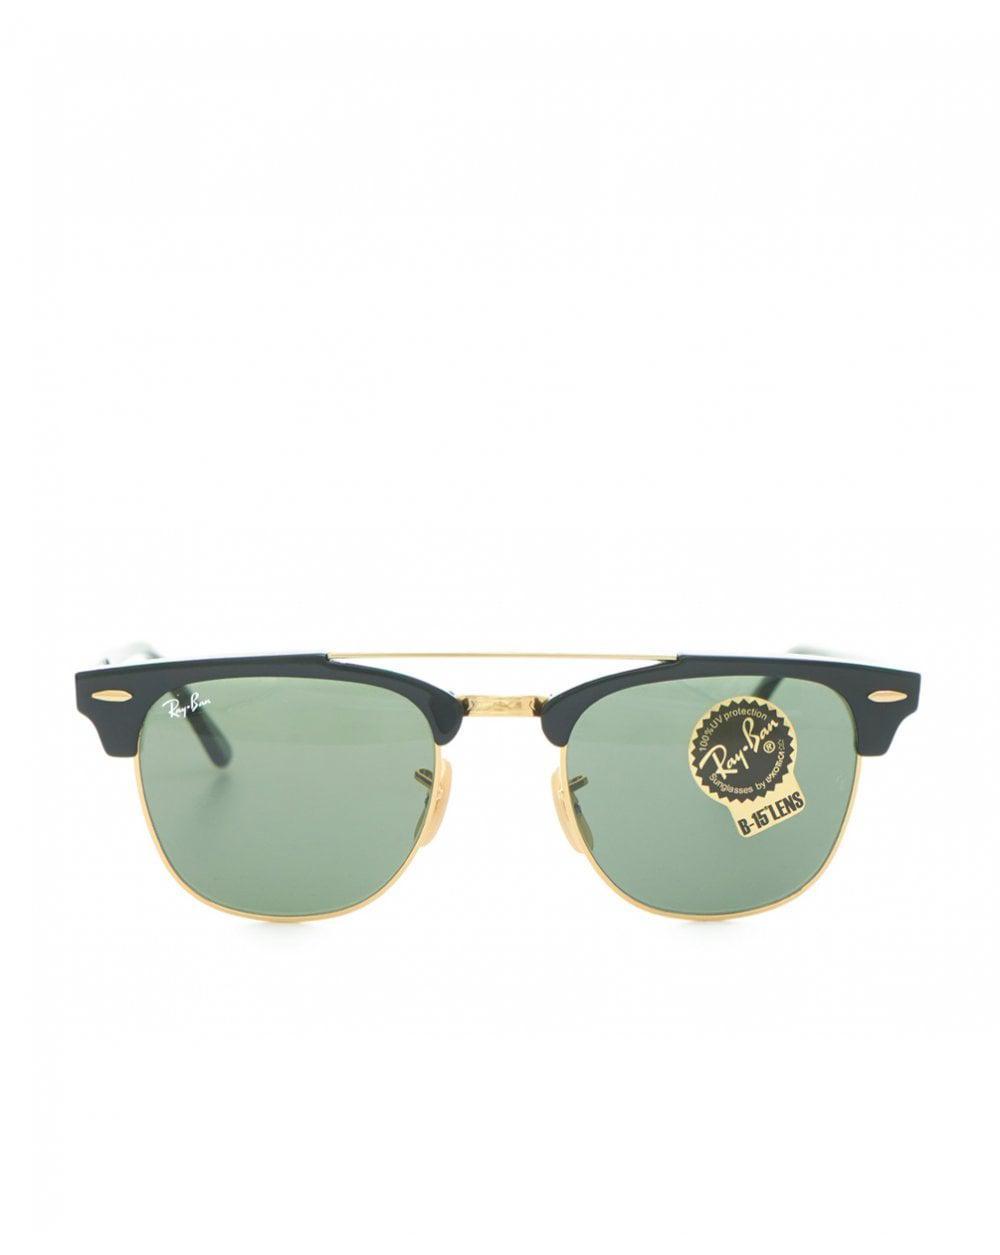 1bdd3c1ba2 Lyst - Ray-Ban Clubmaster Double Bridge Sunglasses in Black for Men